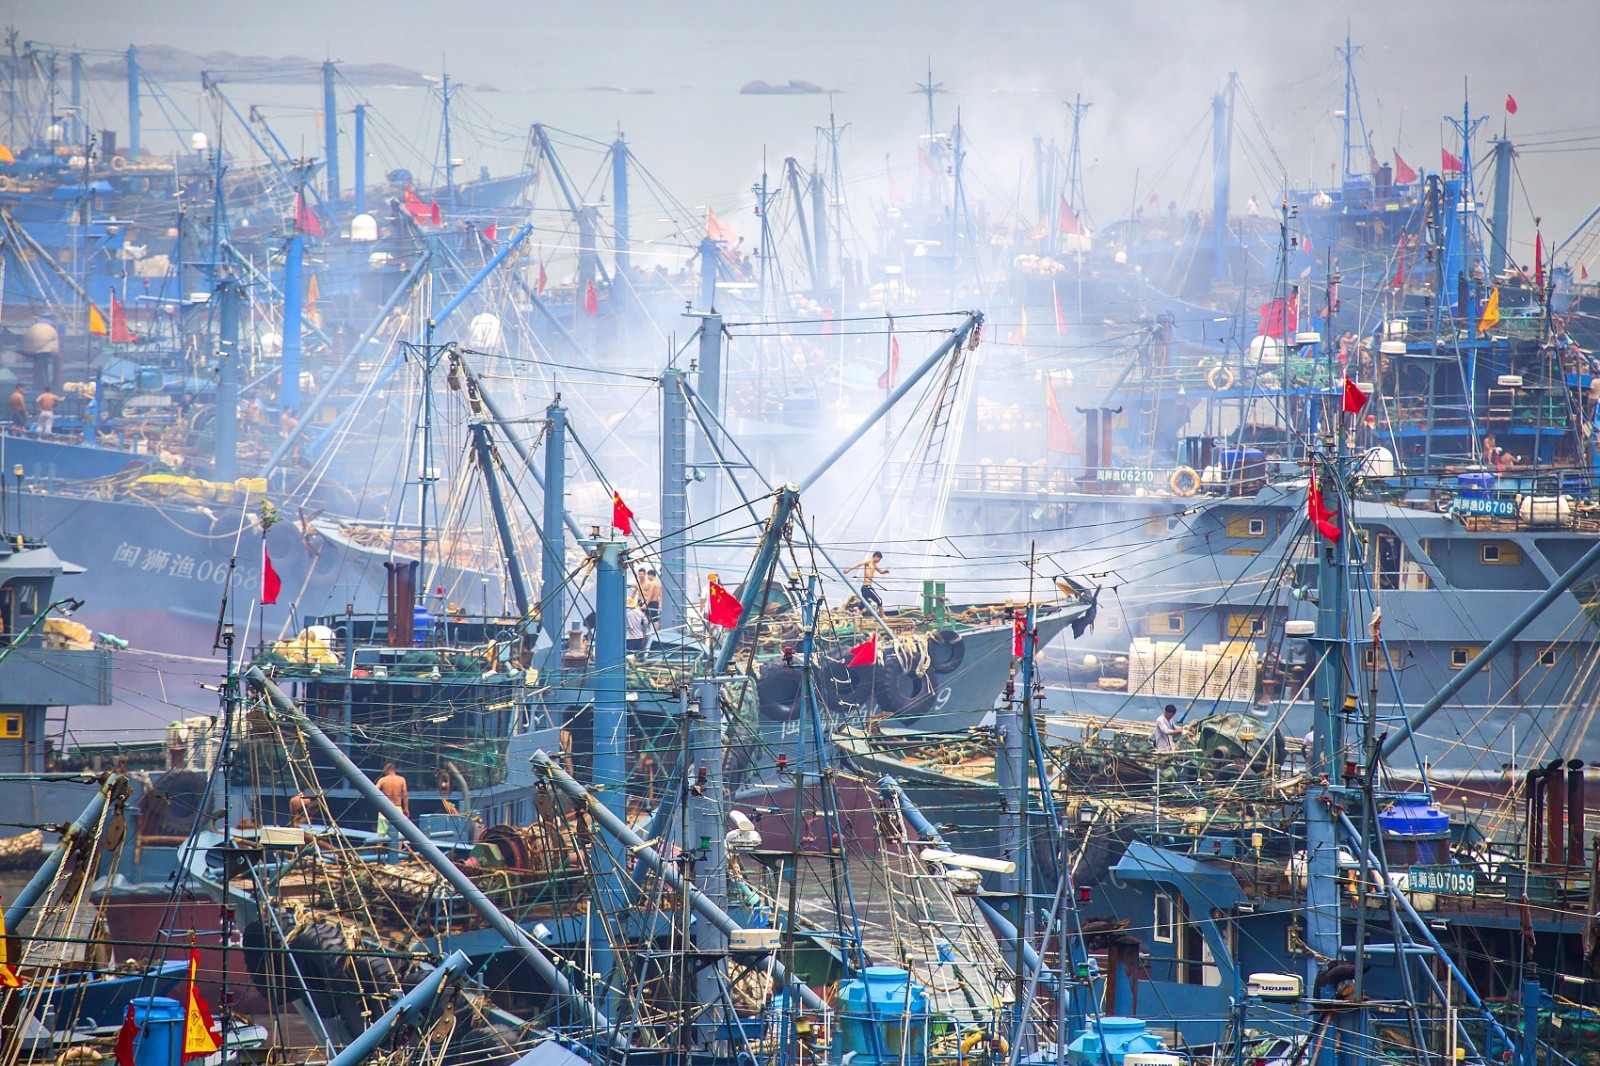 Chinese fishermen gear up for the fishing season in Fujian Province